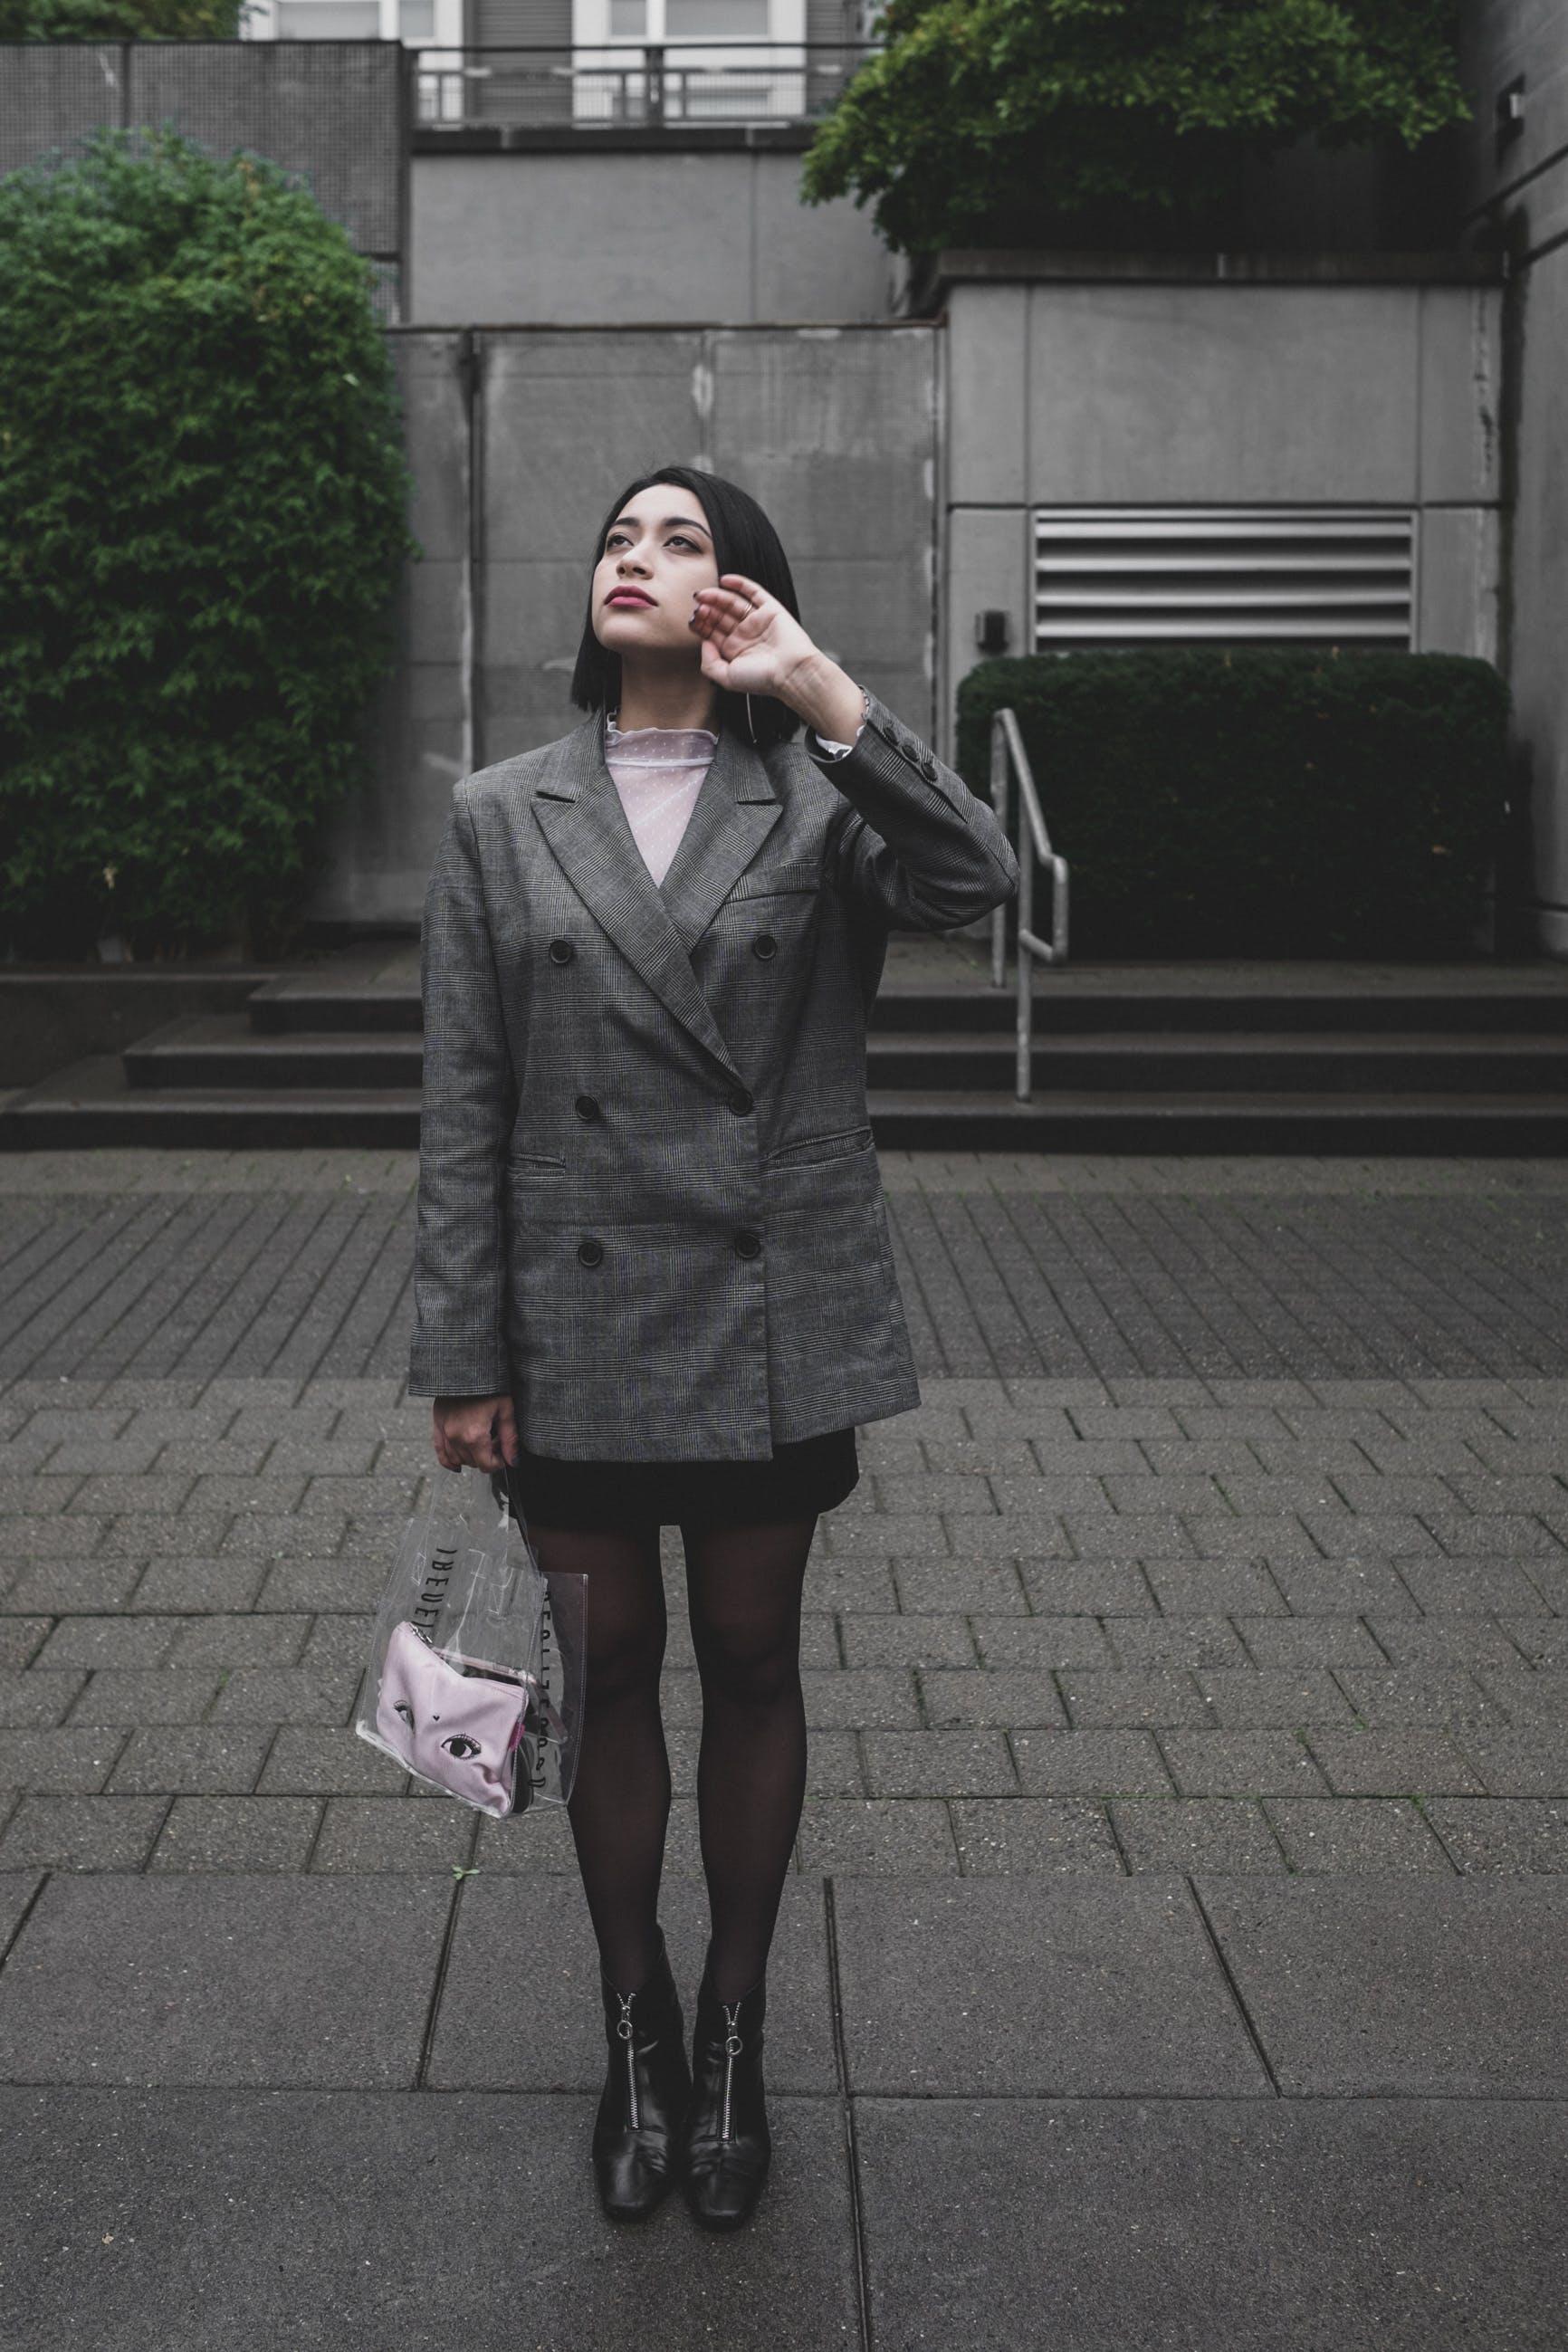 Woman Standing on Gray Pavement Wearing Gray Coat